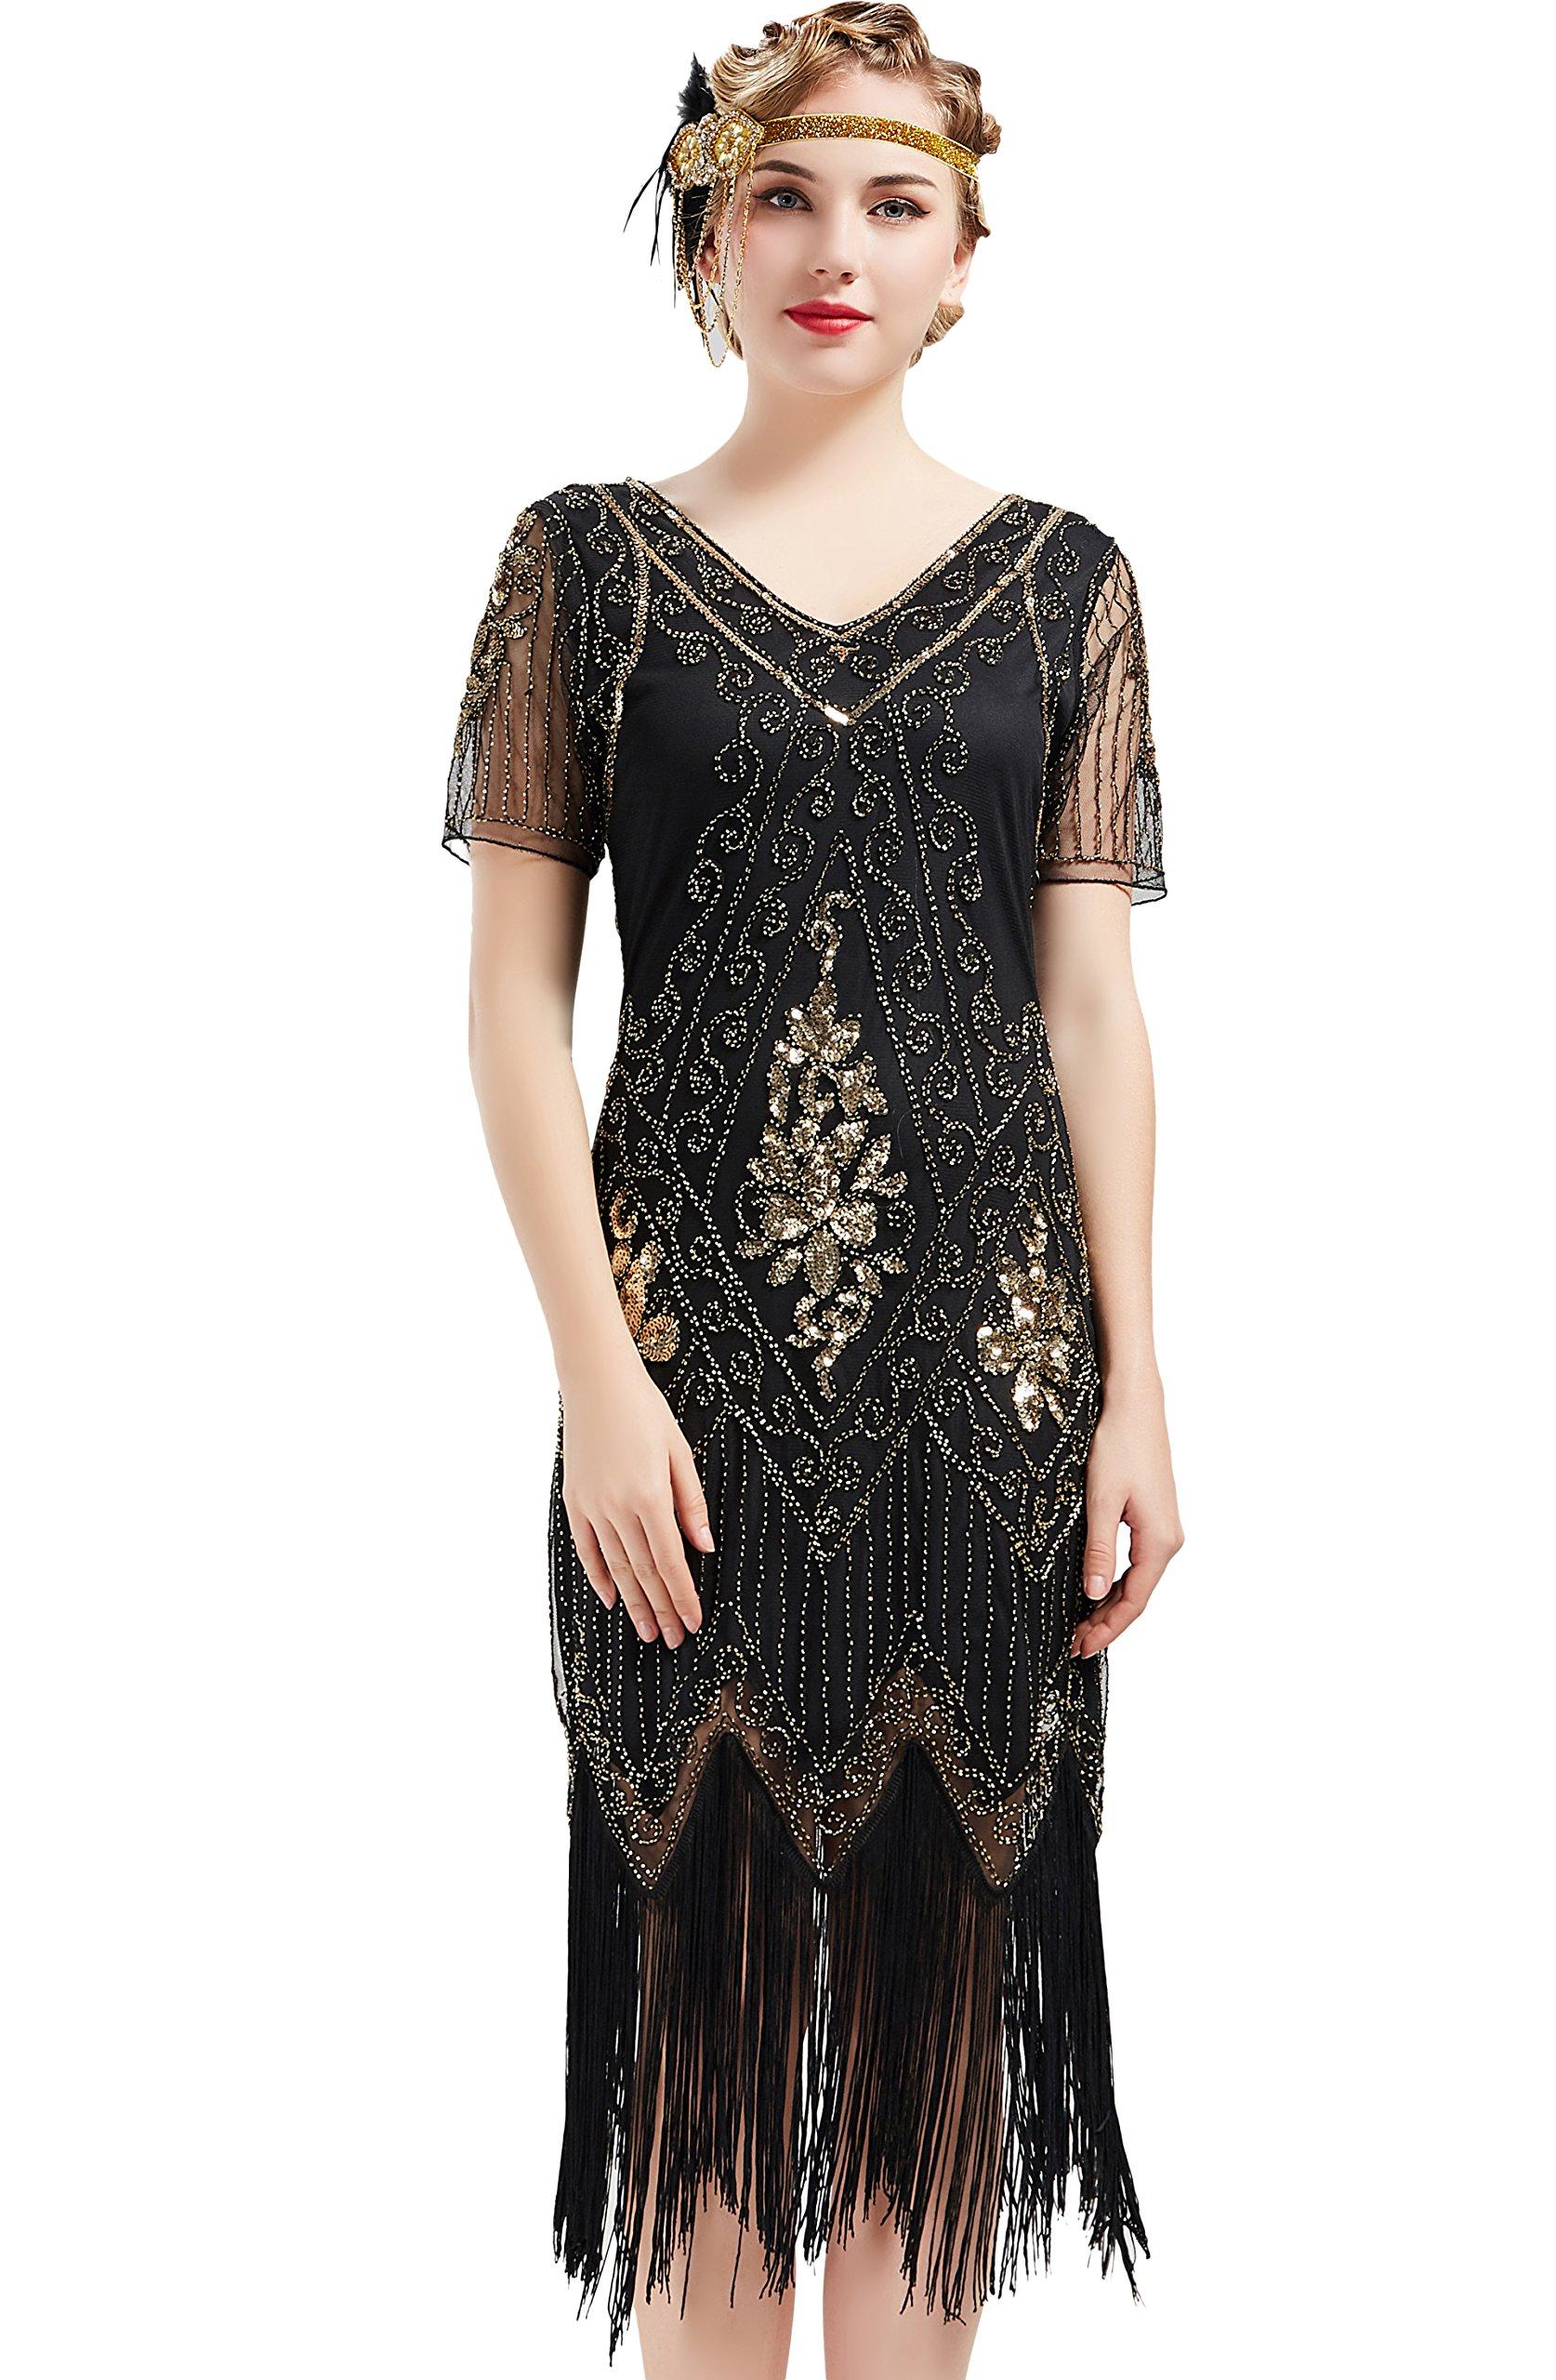 c6d6d1a214 BABEYOND 1920s Art Deco Fringed Sequin Dress Roaring 20s Flapper Fancy Dress  Gatsby Costume Dress Vintage Beaded Evening Dress (Black and Gold